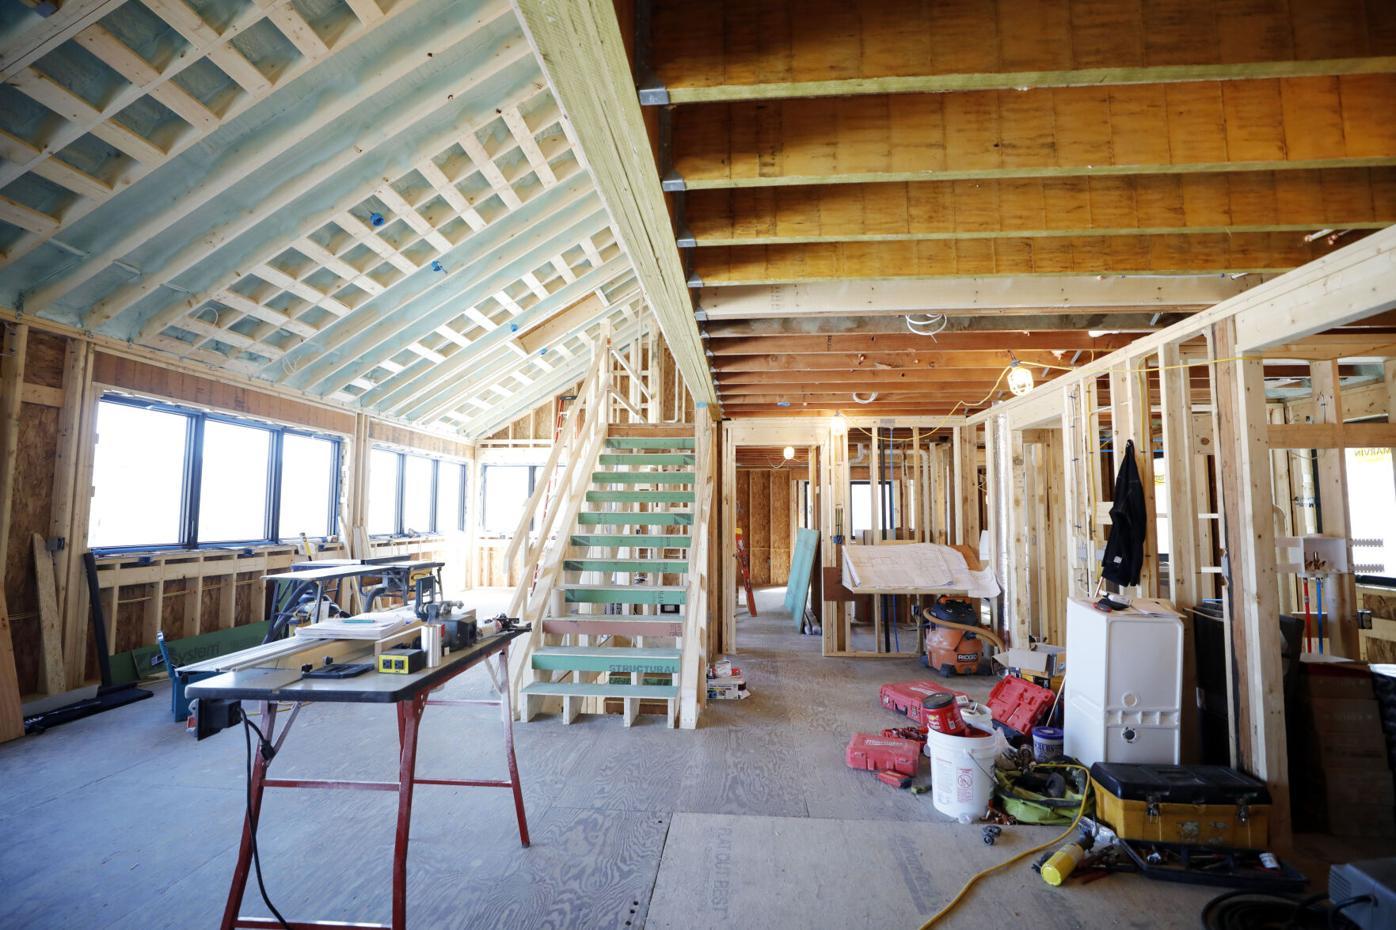 High Cost of Building Materials (copy)